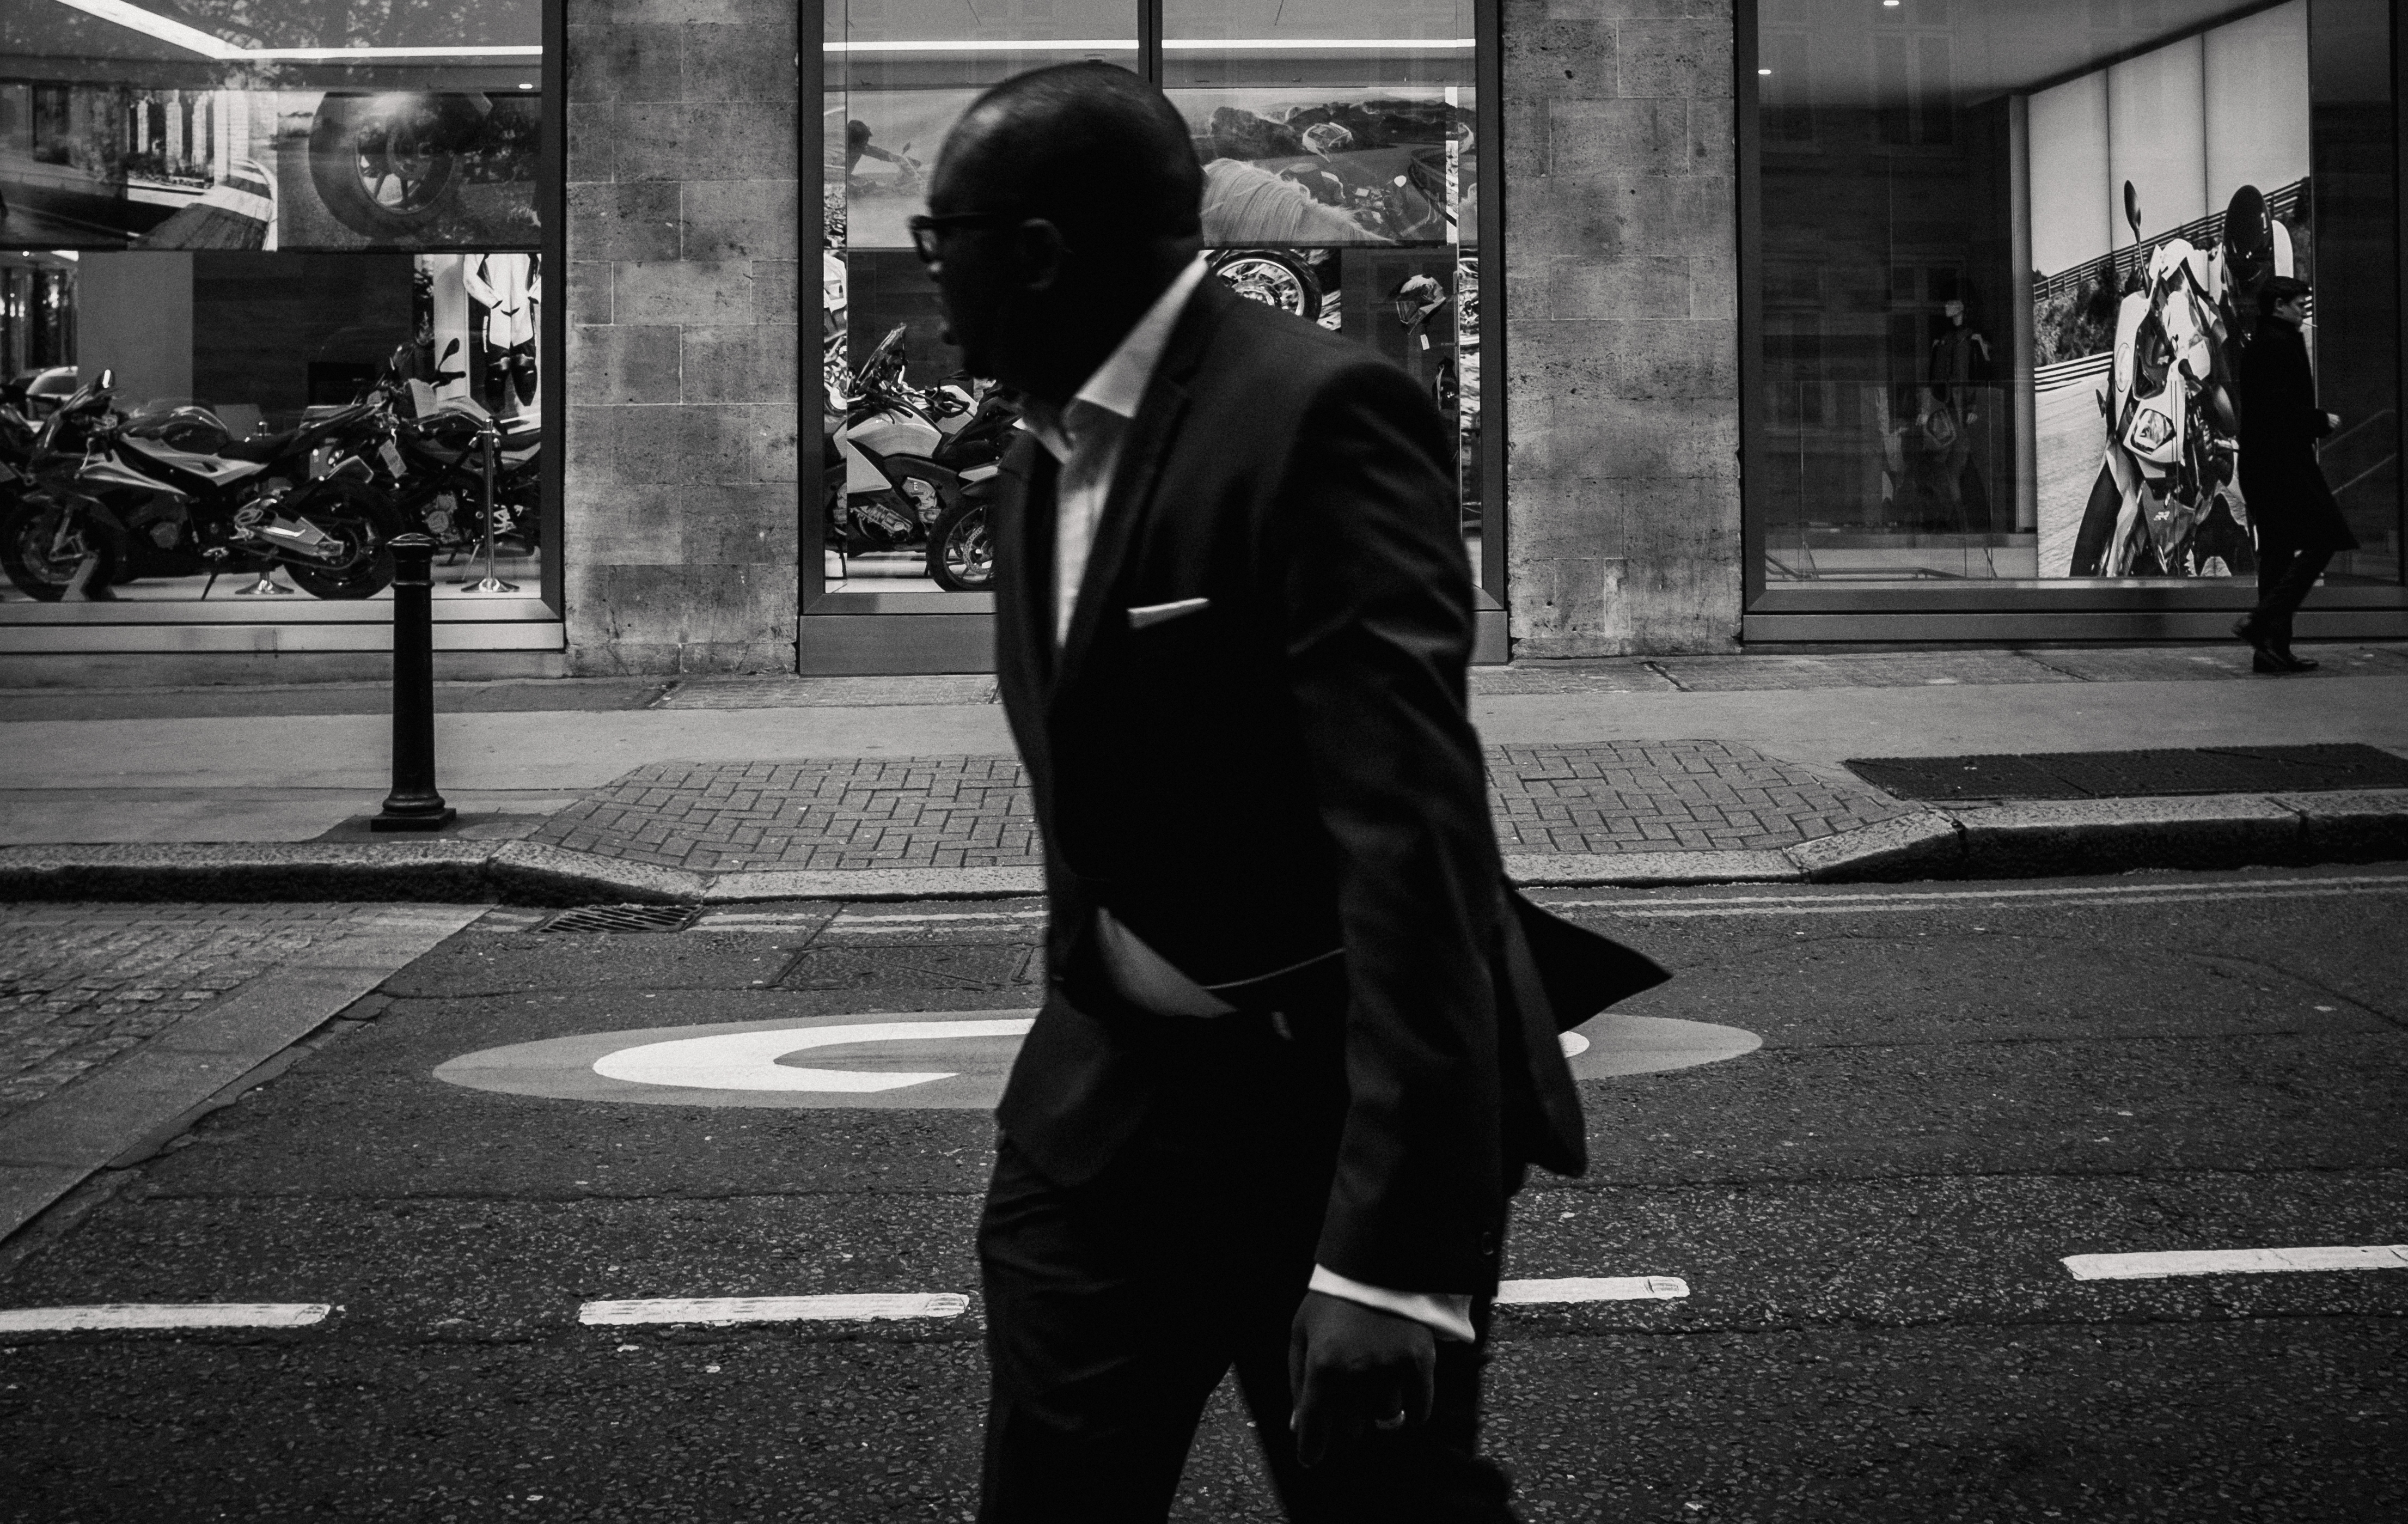 Glance 2 - London - 2015